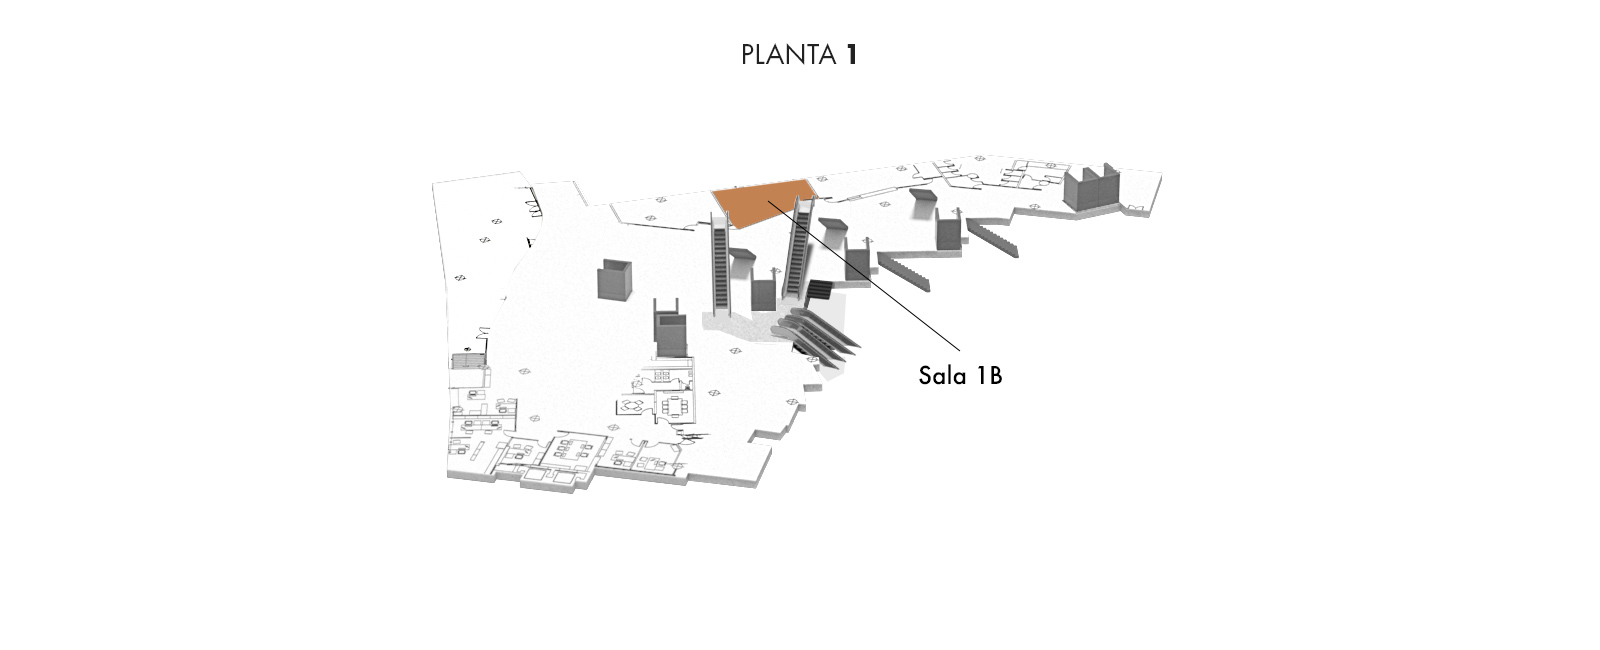 Sala 1B, Planta 1 | Palacio Euskalduna Jauregia